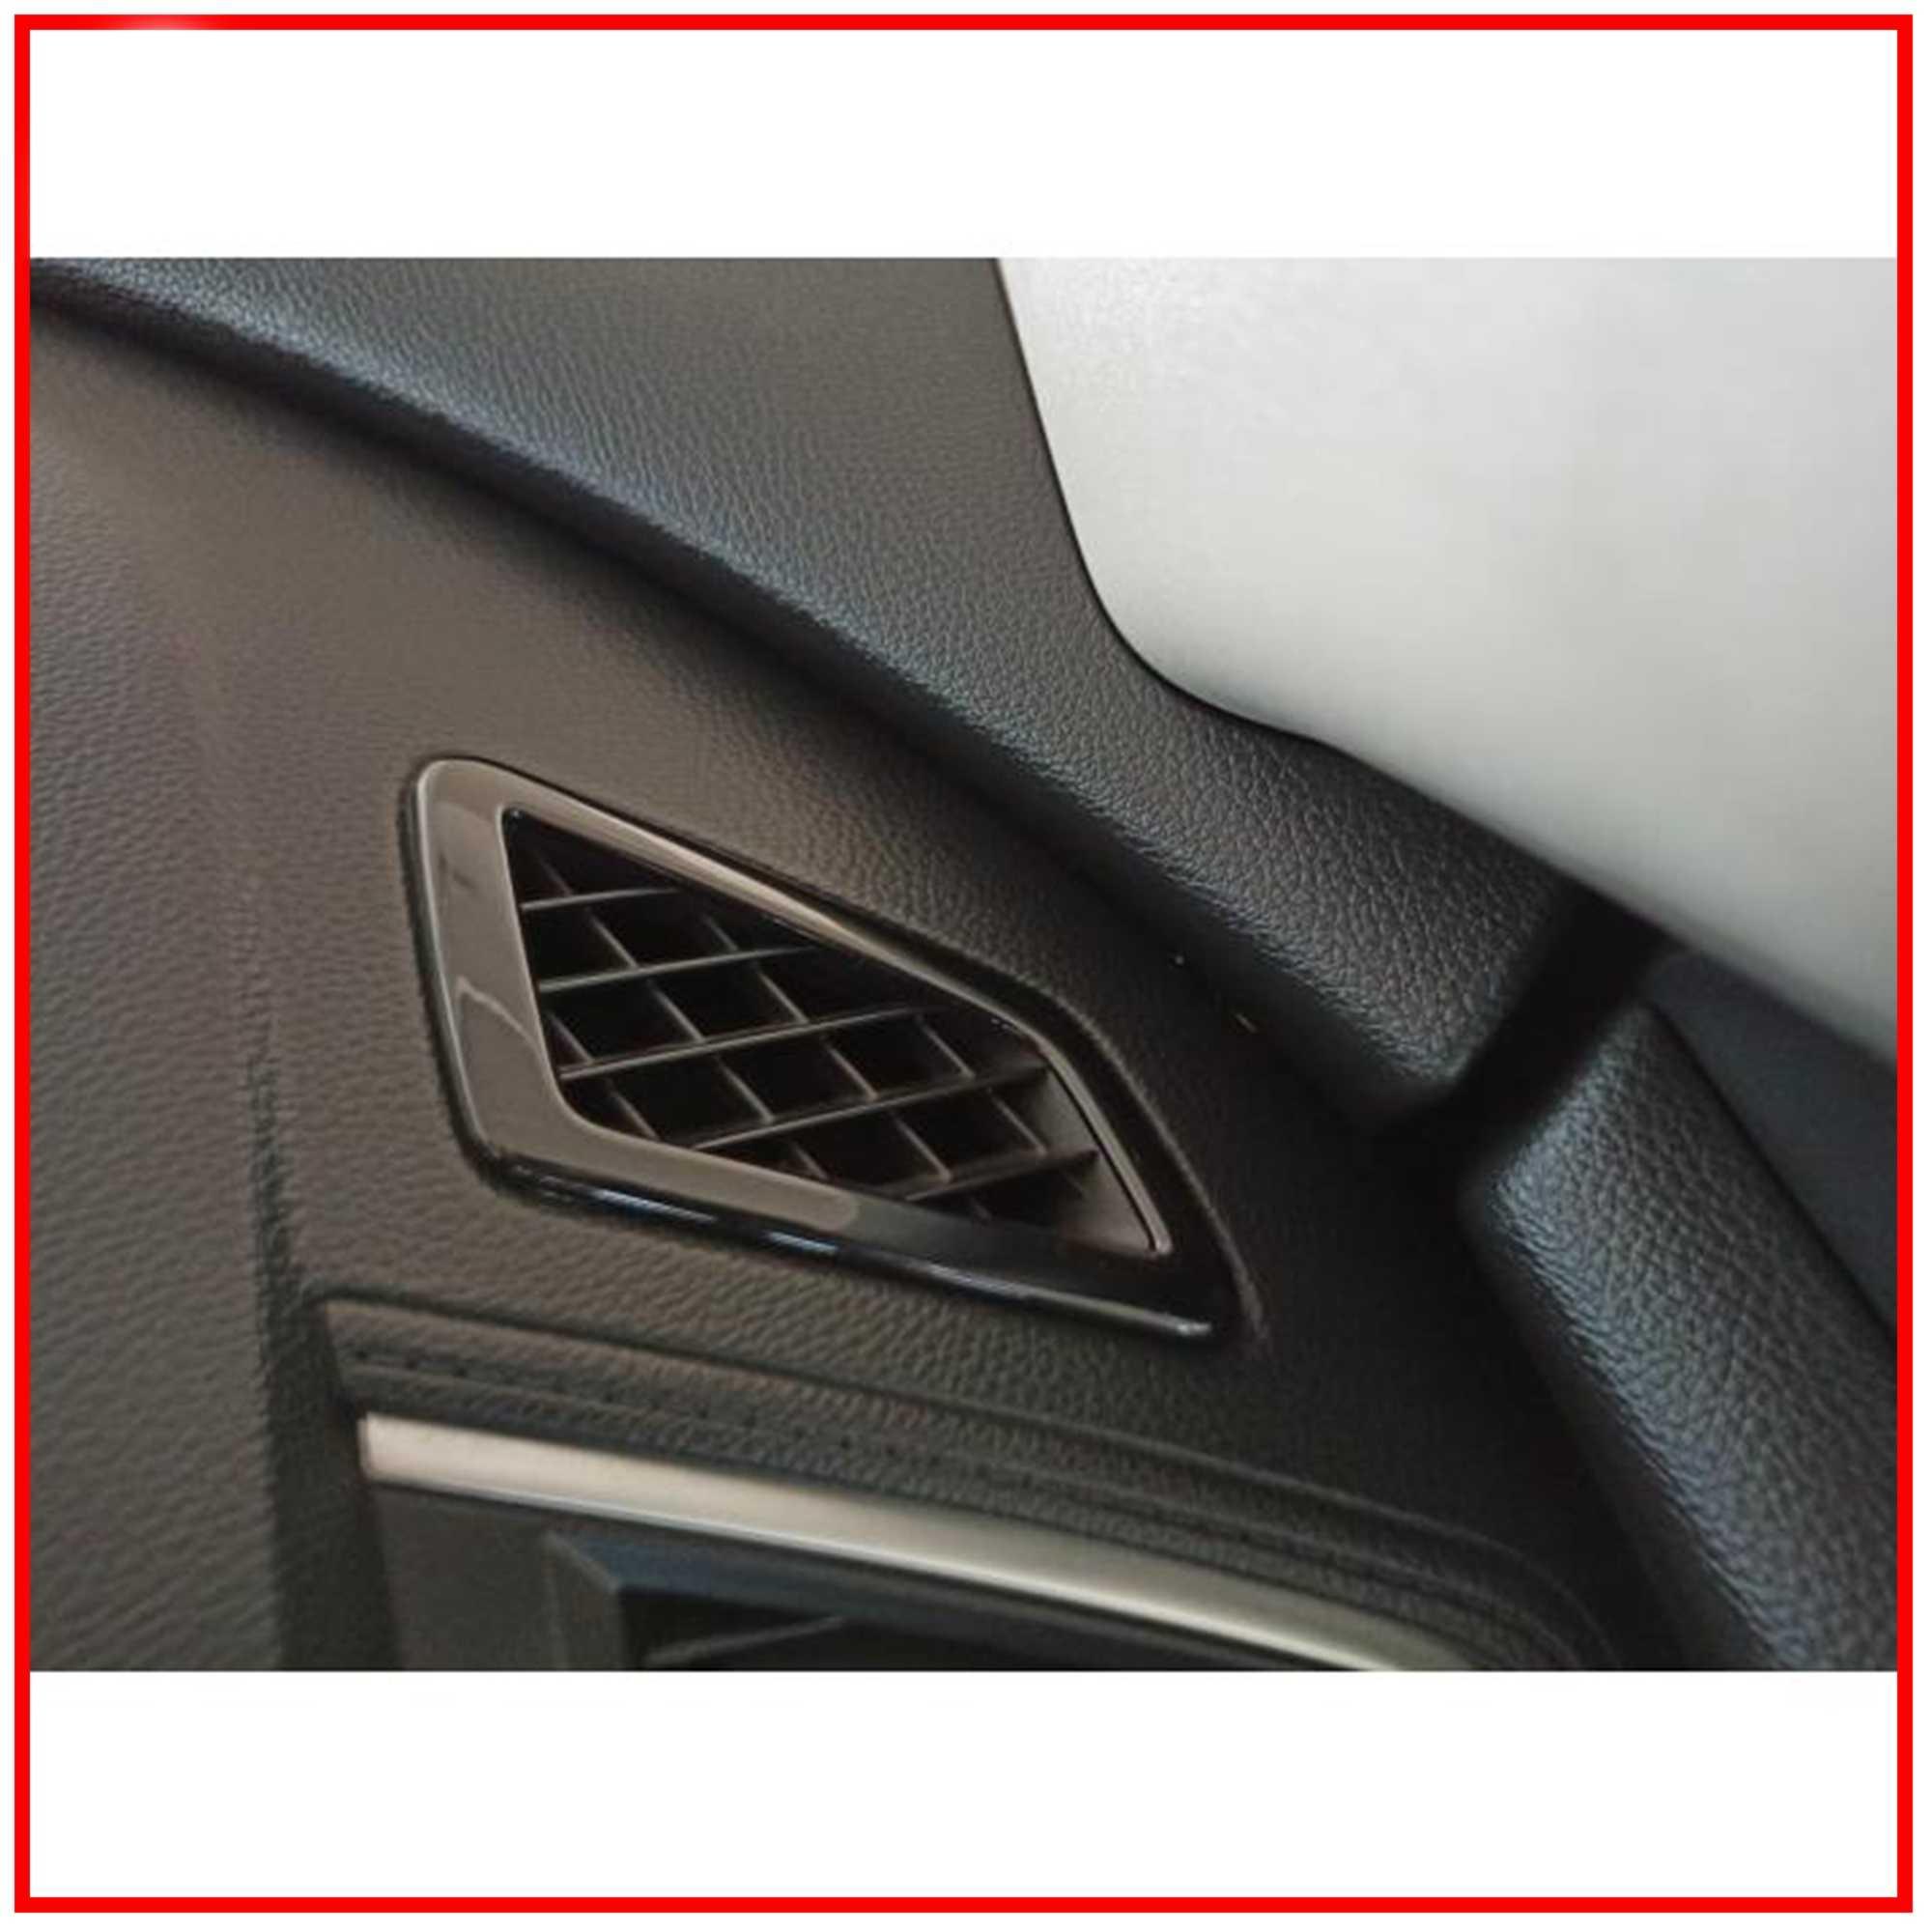 Honda Civic FC5 Üst Hava Menfez Kaplama (PİANO BLACK) 2016-2020